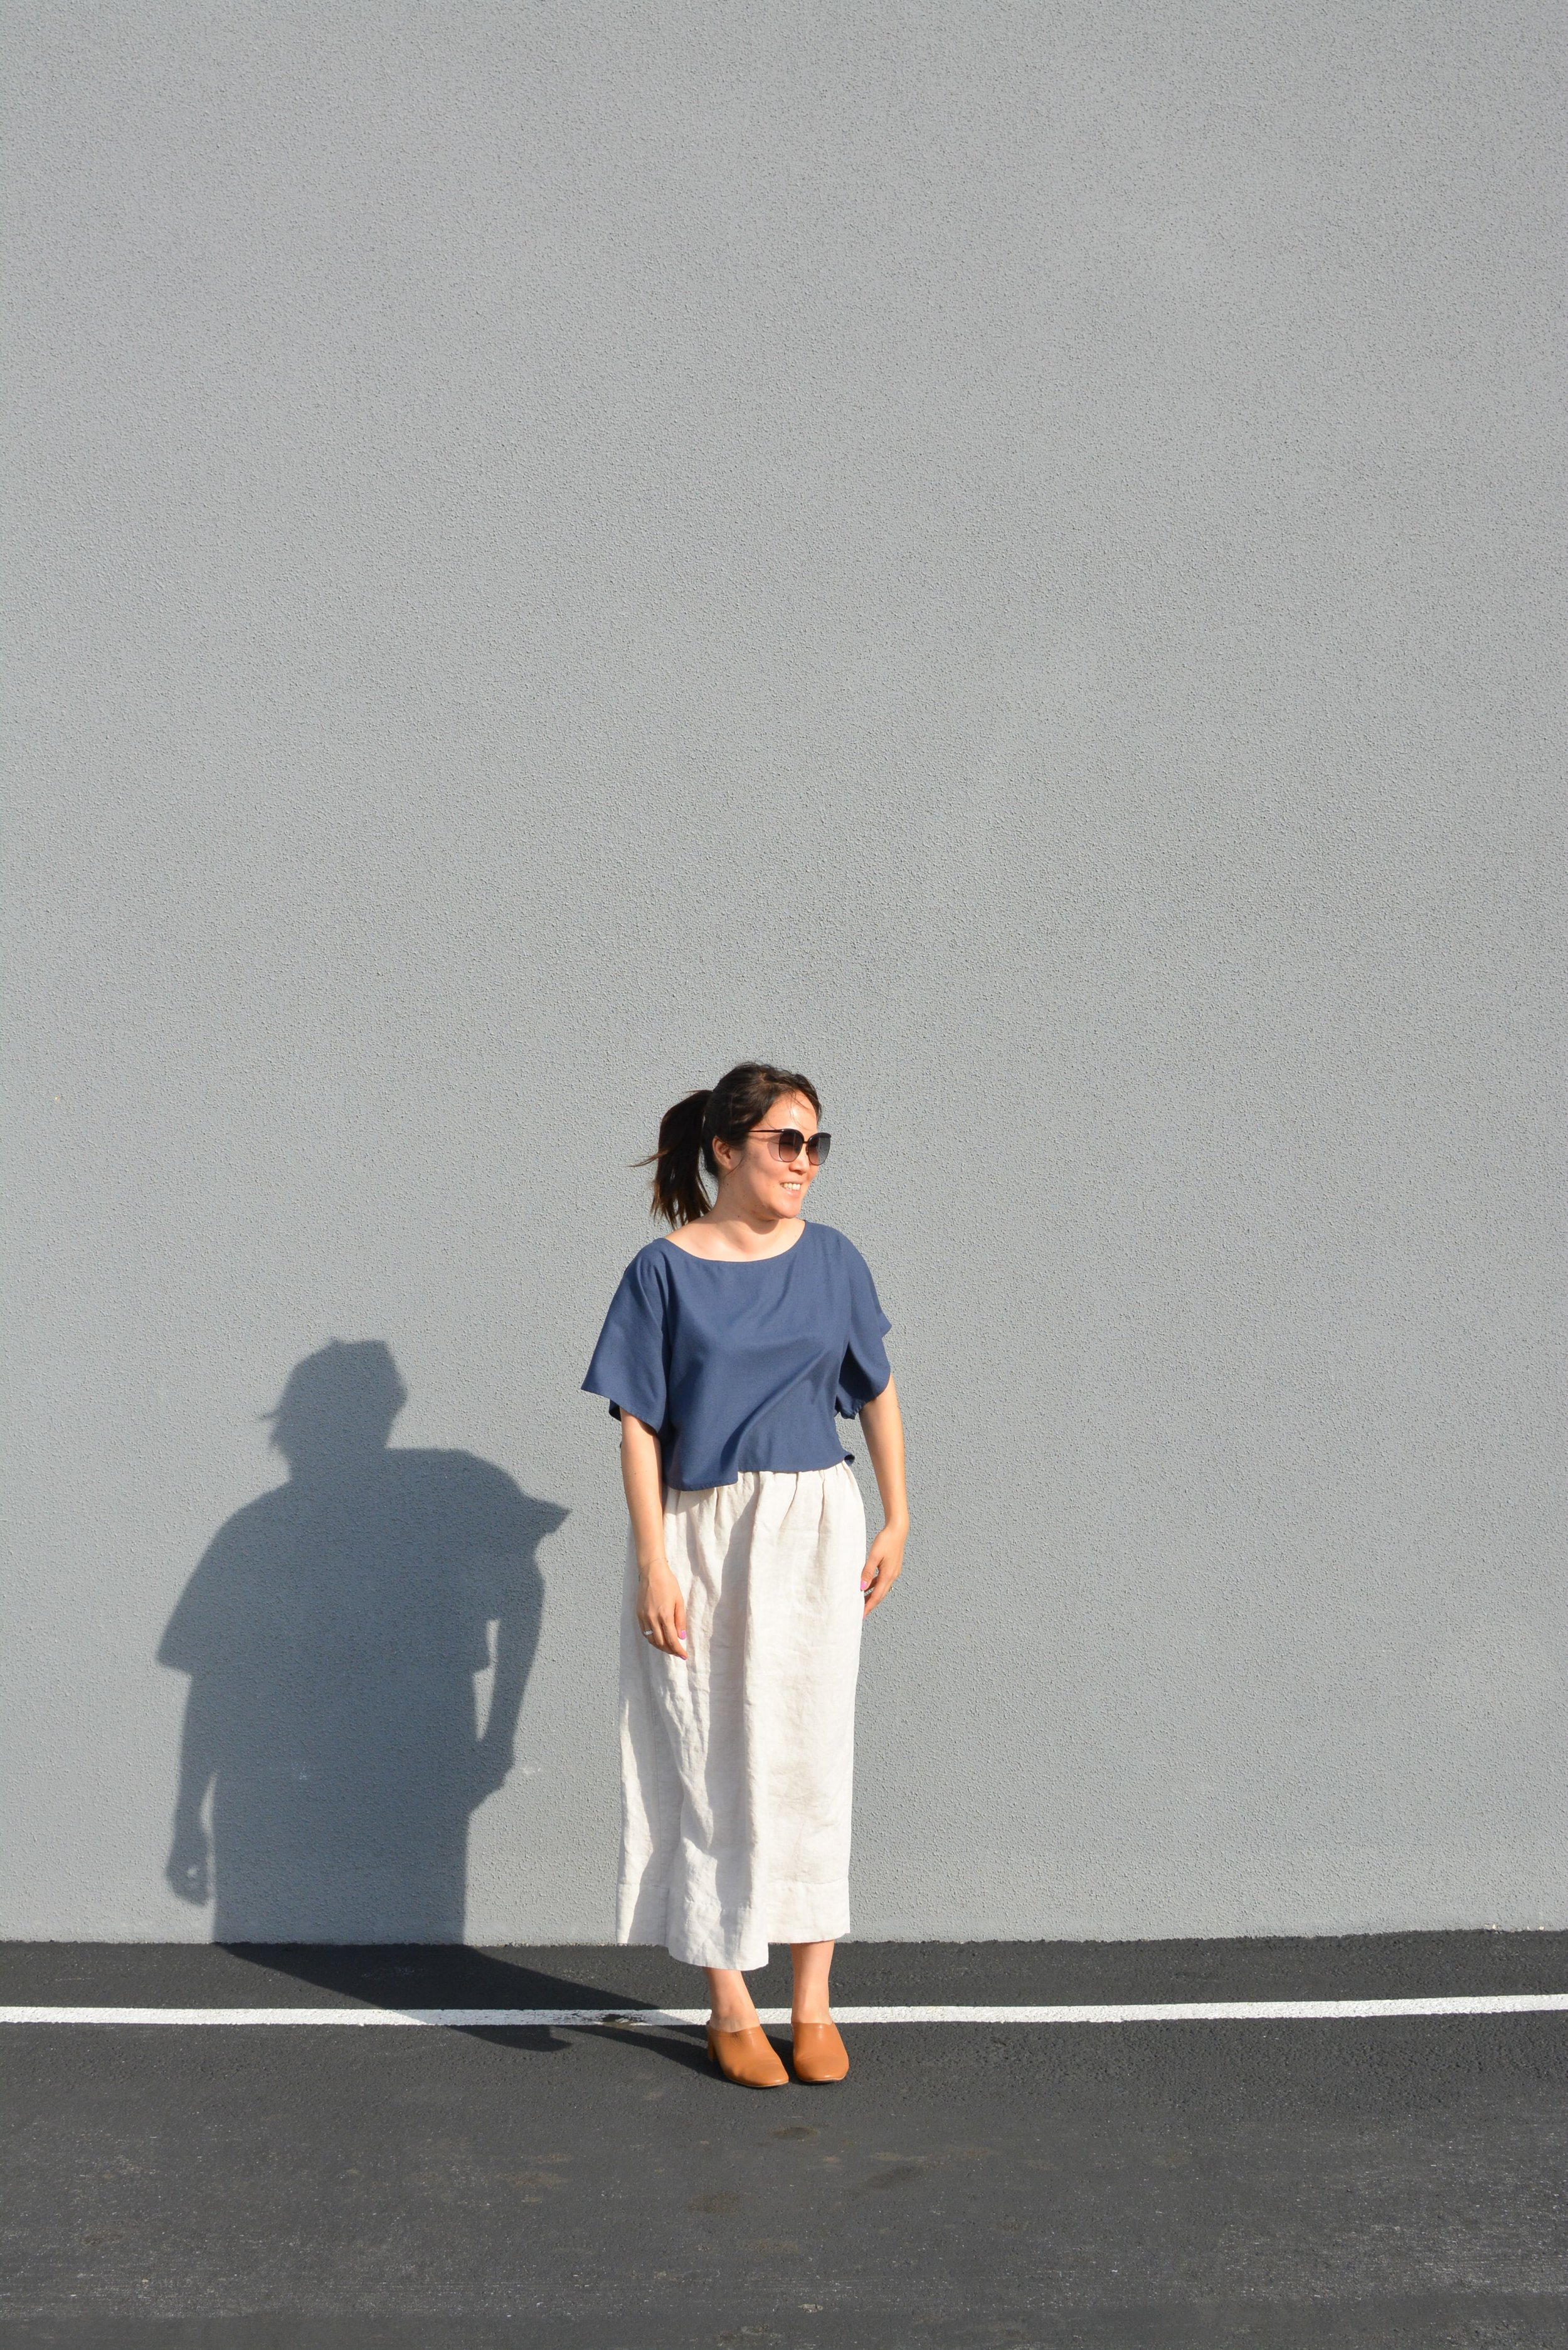 Elizabeth Suzann Review Linen Bel Skirt (2 of 6)-min.jpg